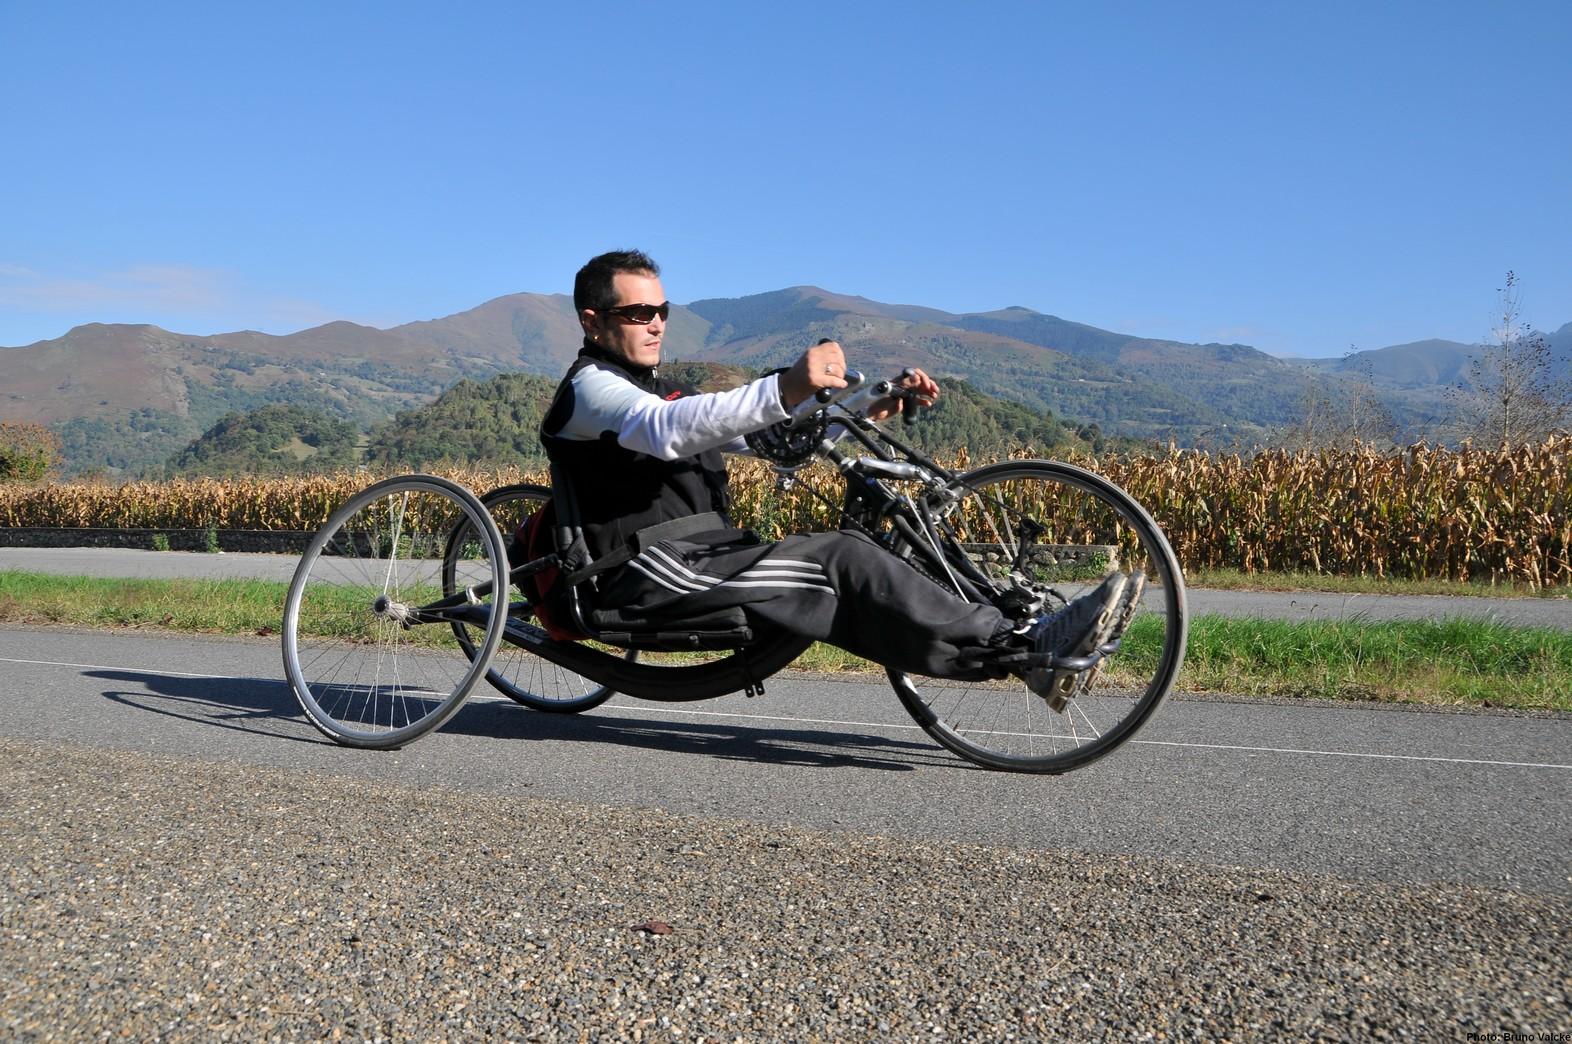 http://www.valleesdesgaves.com/gp/Une-voie-accessible-a-tous/55